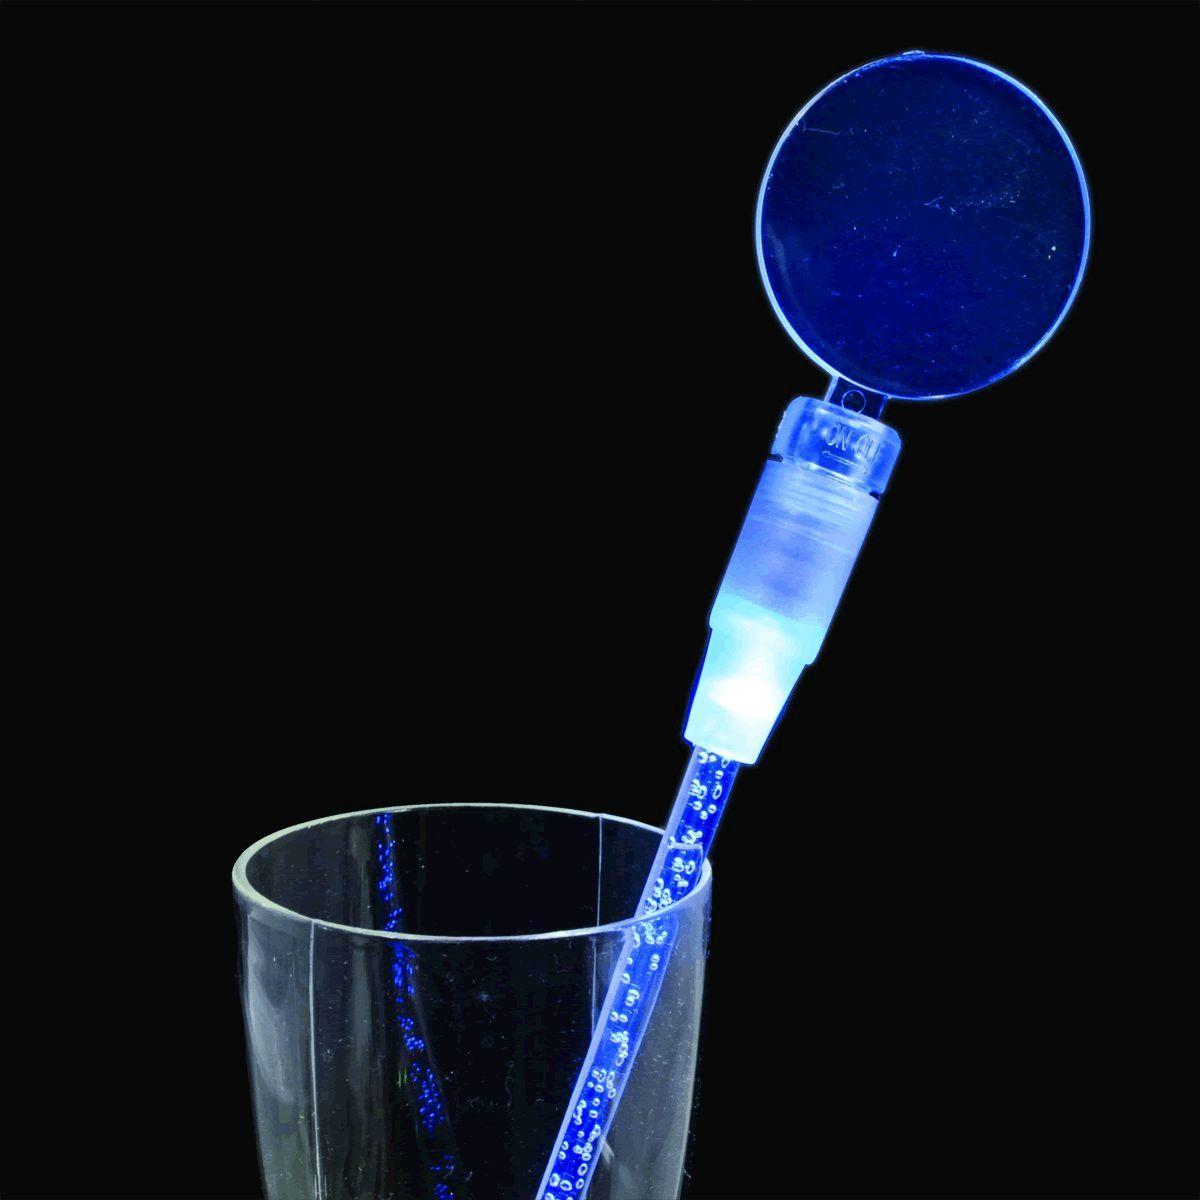 Blue Cocktail Party Light Up Swizzle Stick Drink Stirrer | Blinkee